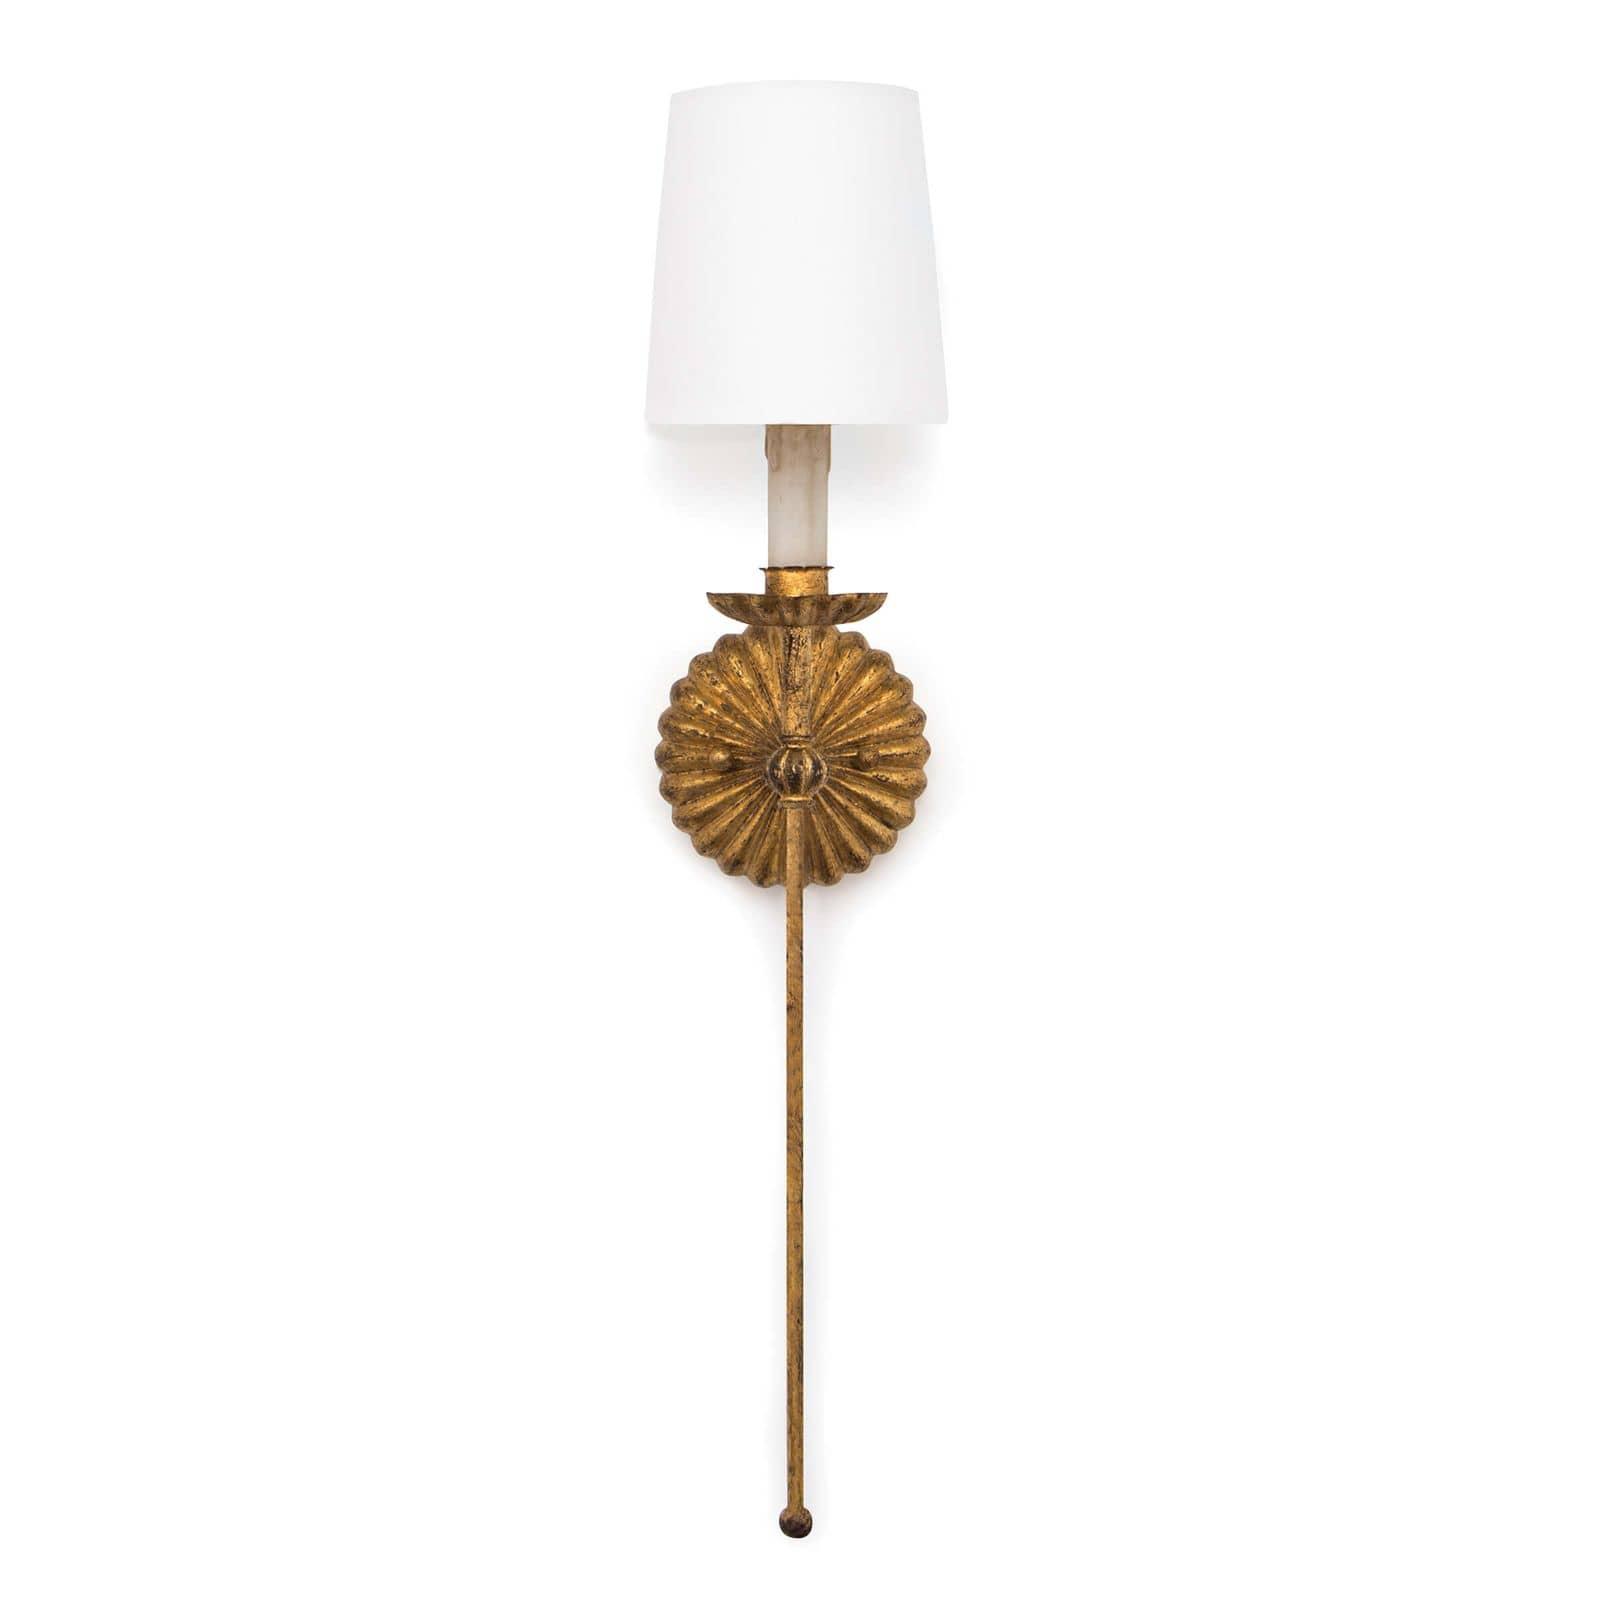 Clove Sconce Single Antique Gold Leaf | Regina Andrew